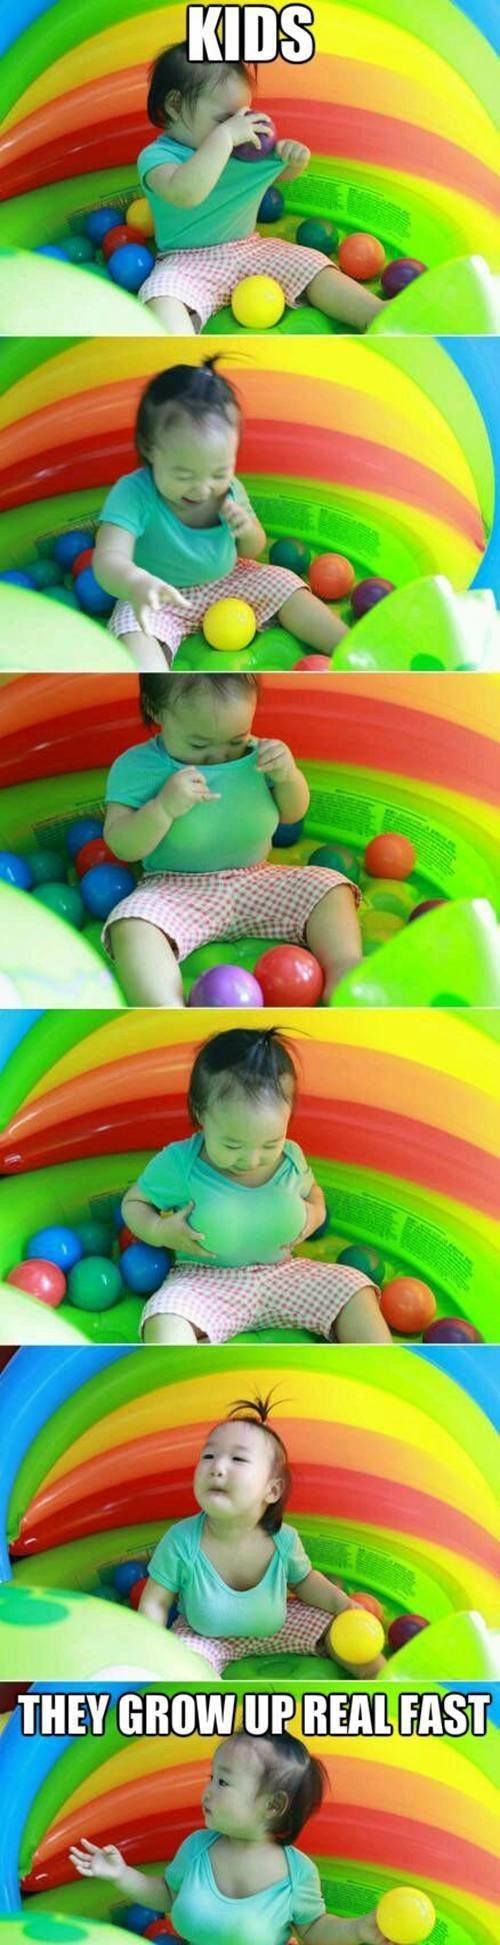 kids parenting toys - 7936460032